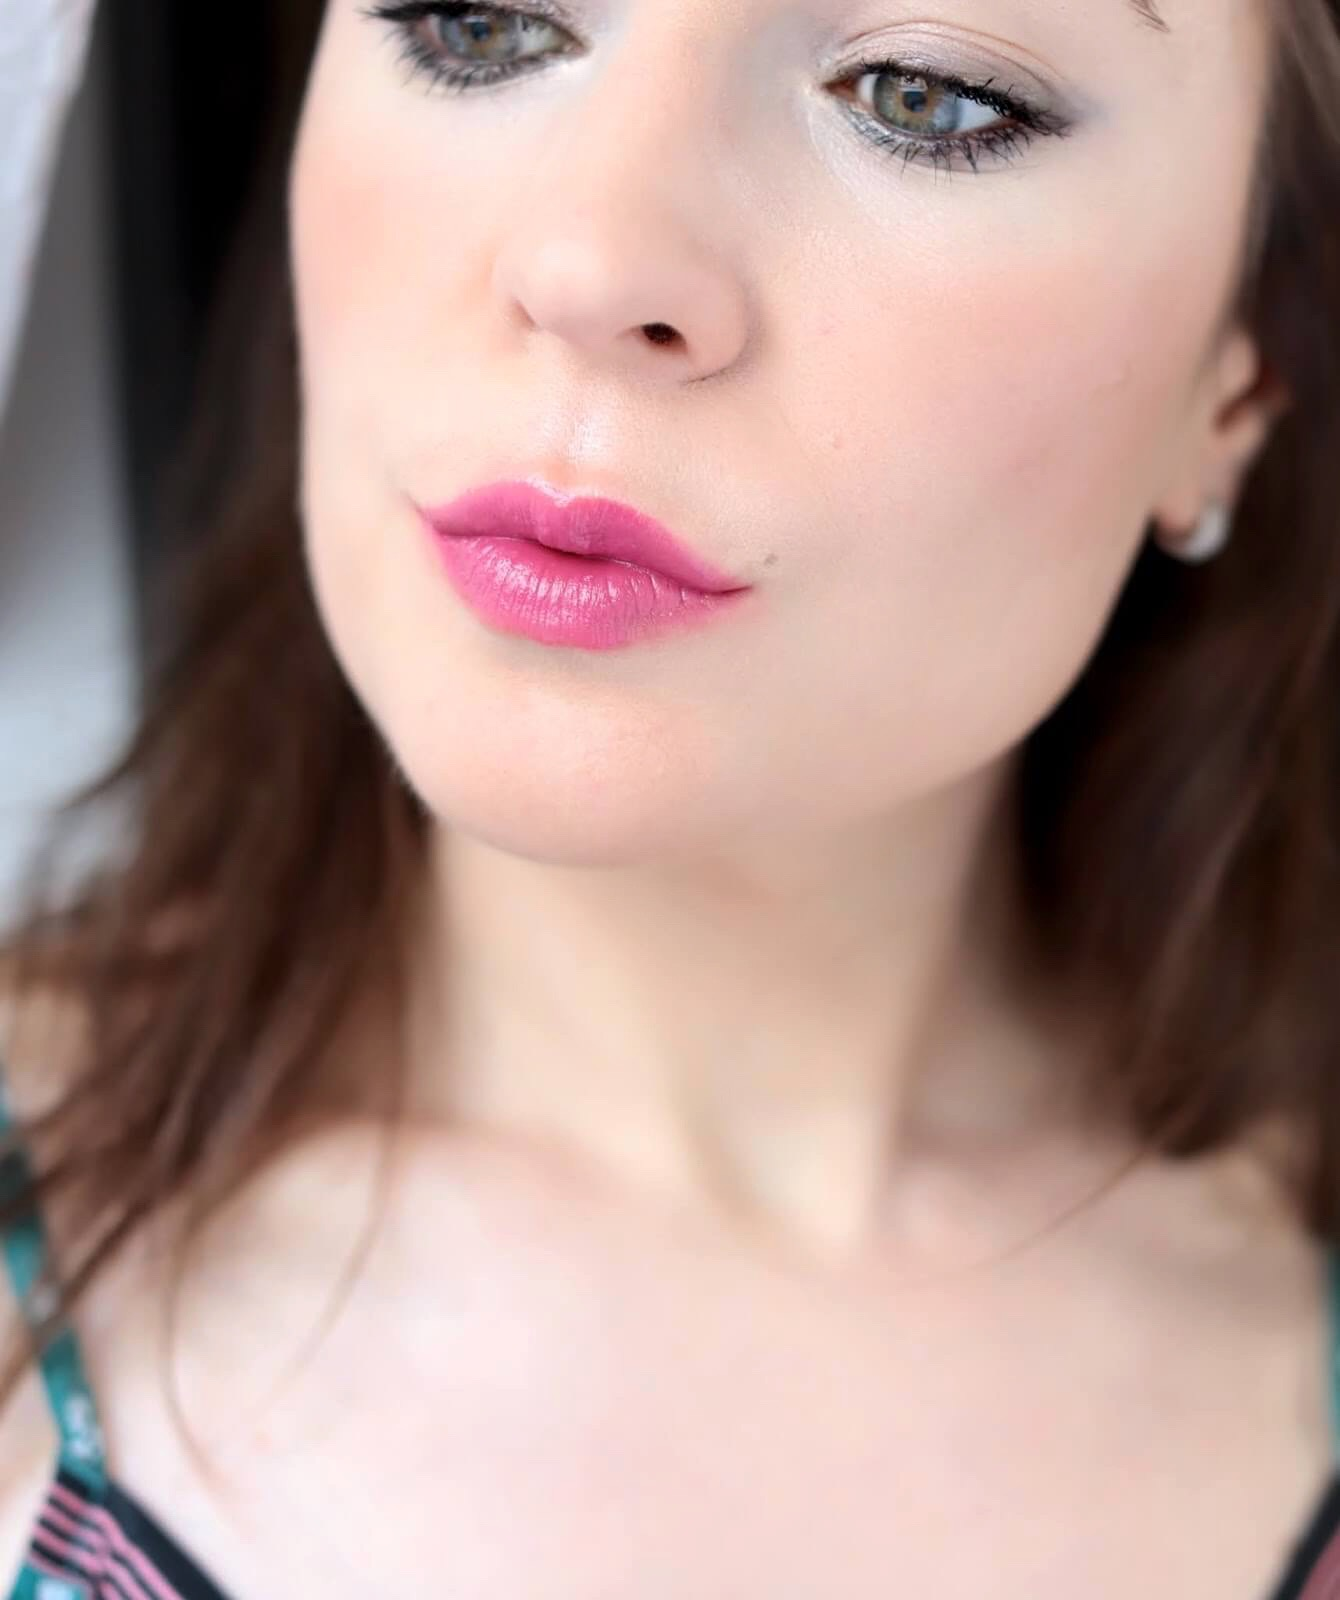 Kjaer Weis Lip Tint Baume à Lèvres Teinté Rapture swatch